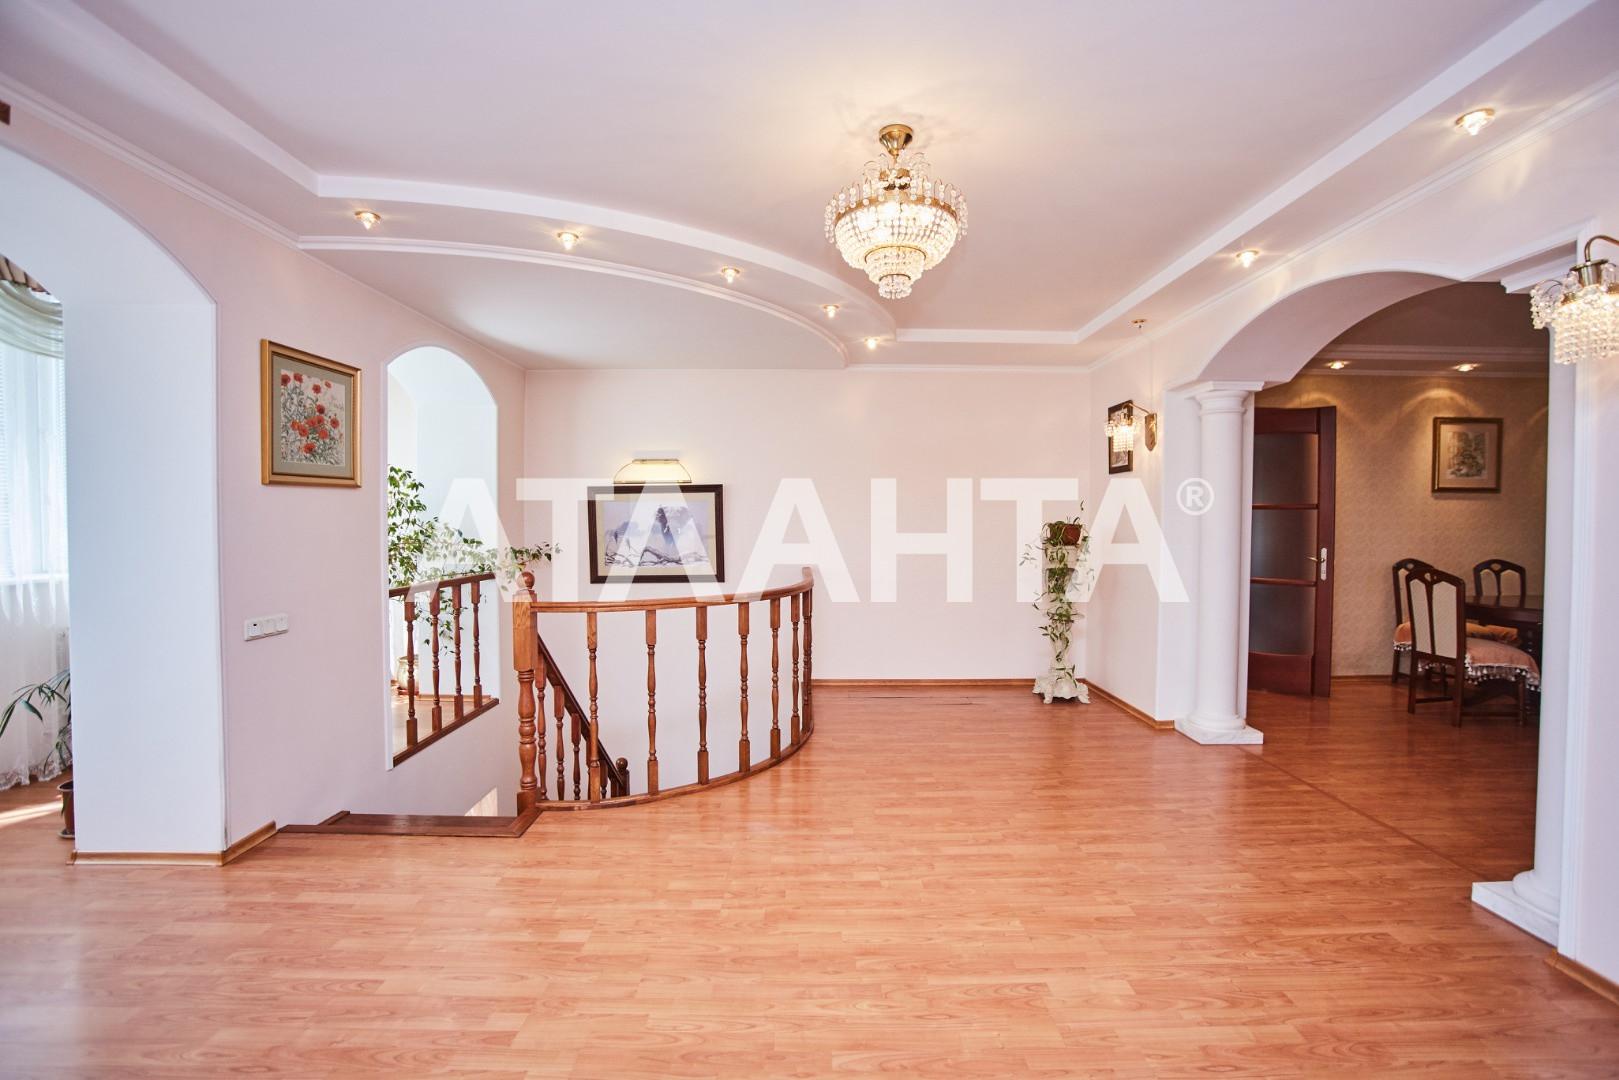 Продается Многоуровневая Квартира на ул. Посмитного — 295 000 у.е. (фото №19)